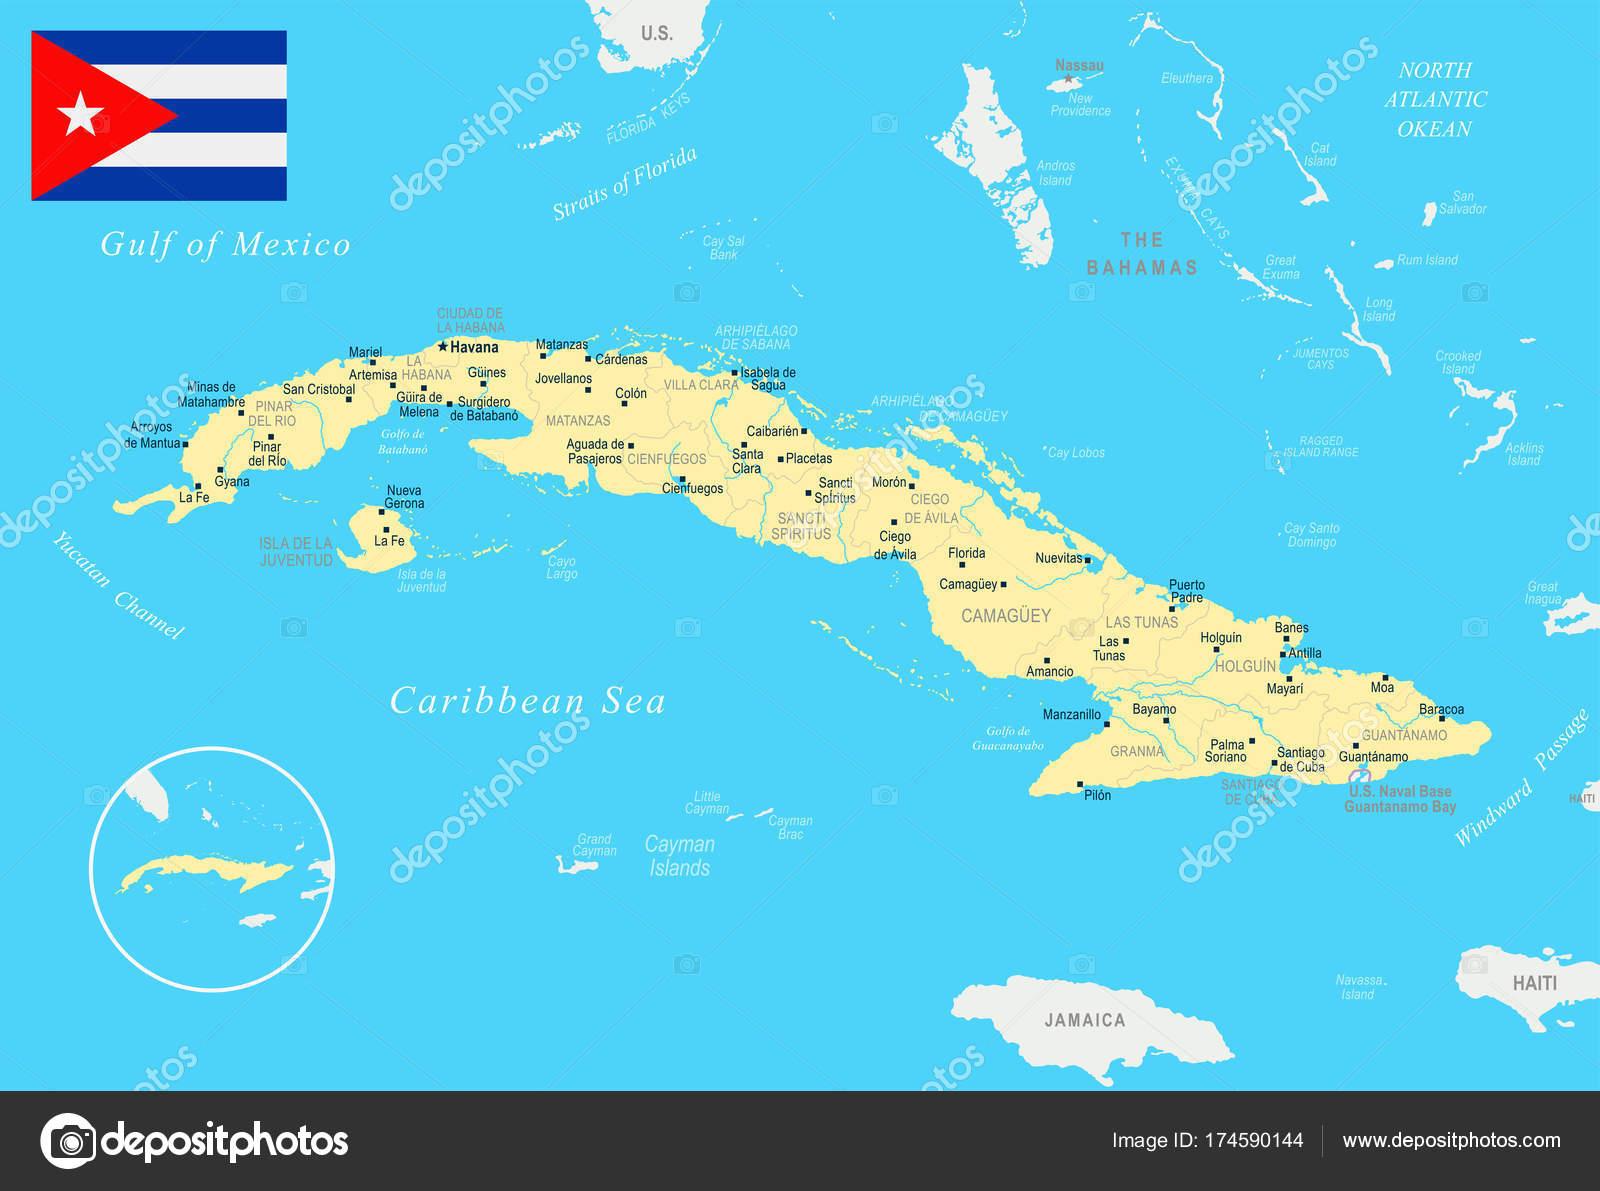 Carte Cuba Detaillee.Carte De Cuba Illustration Detaillee De Vecteur Image